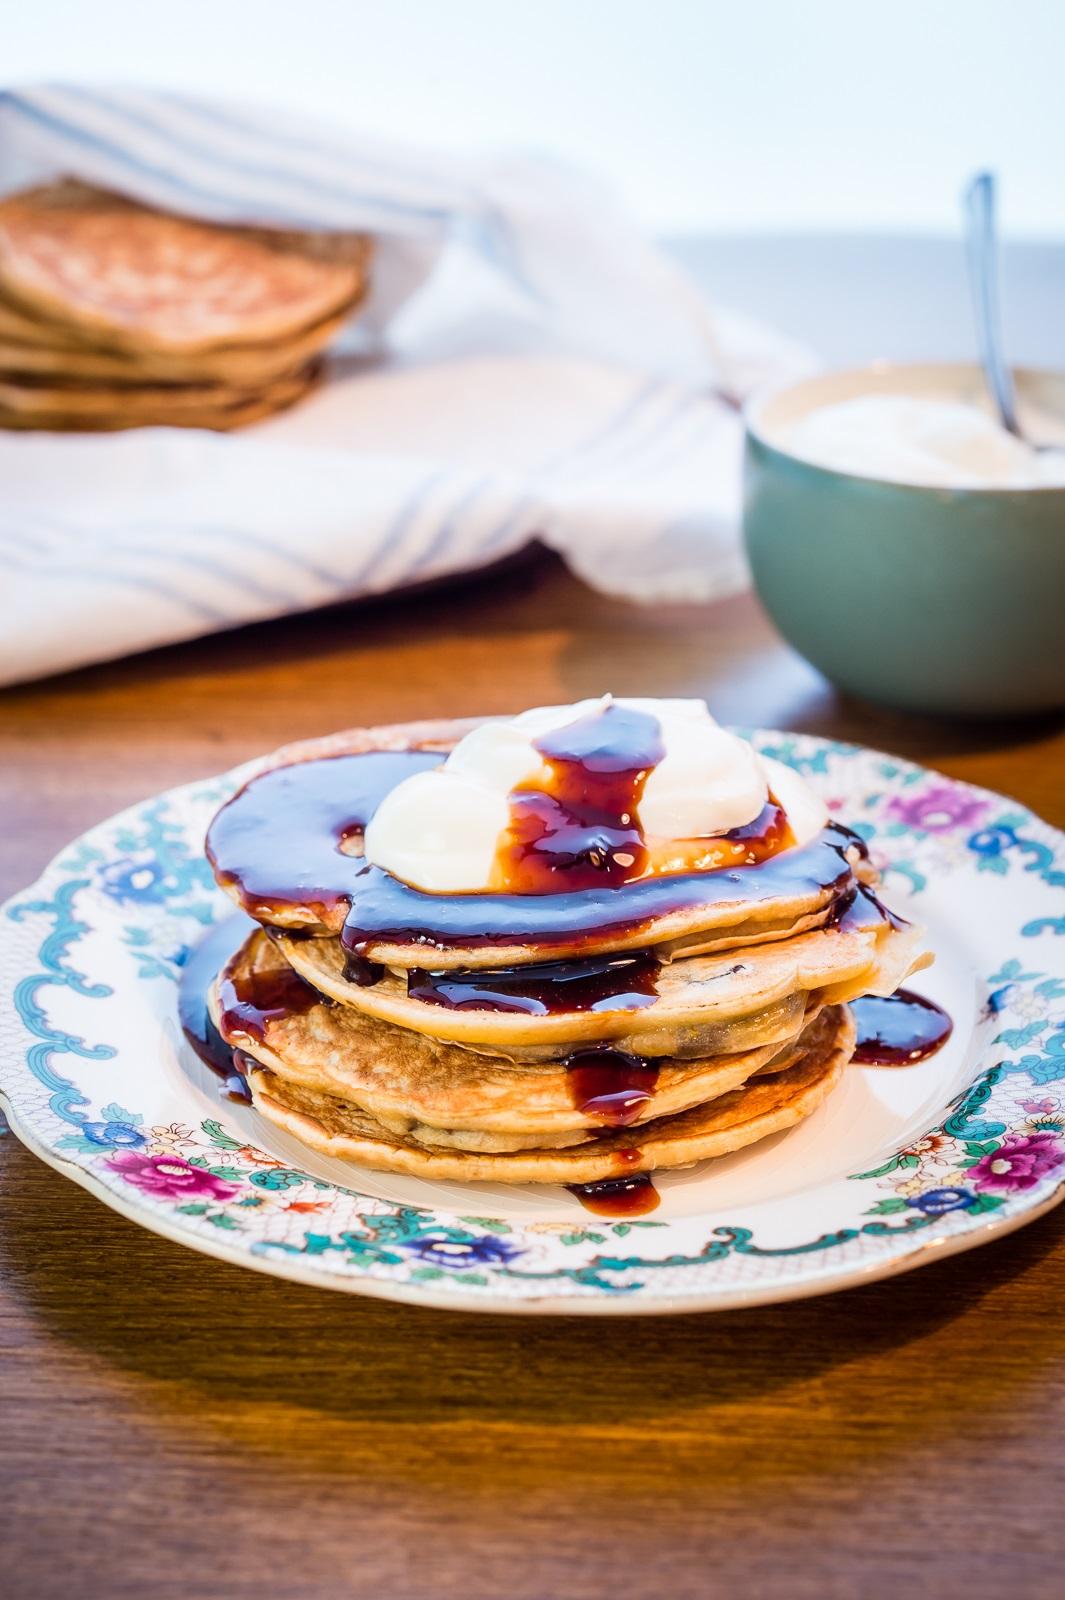 Jennifer Irvine's California Prune And Orange Pancakes